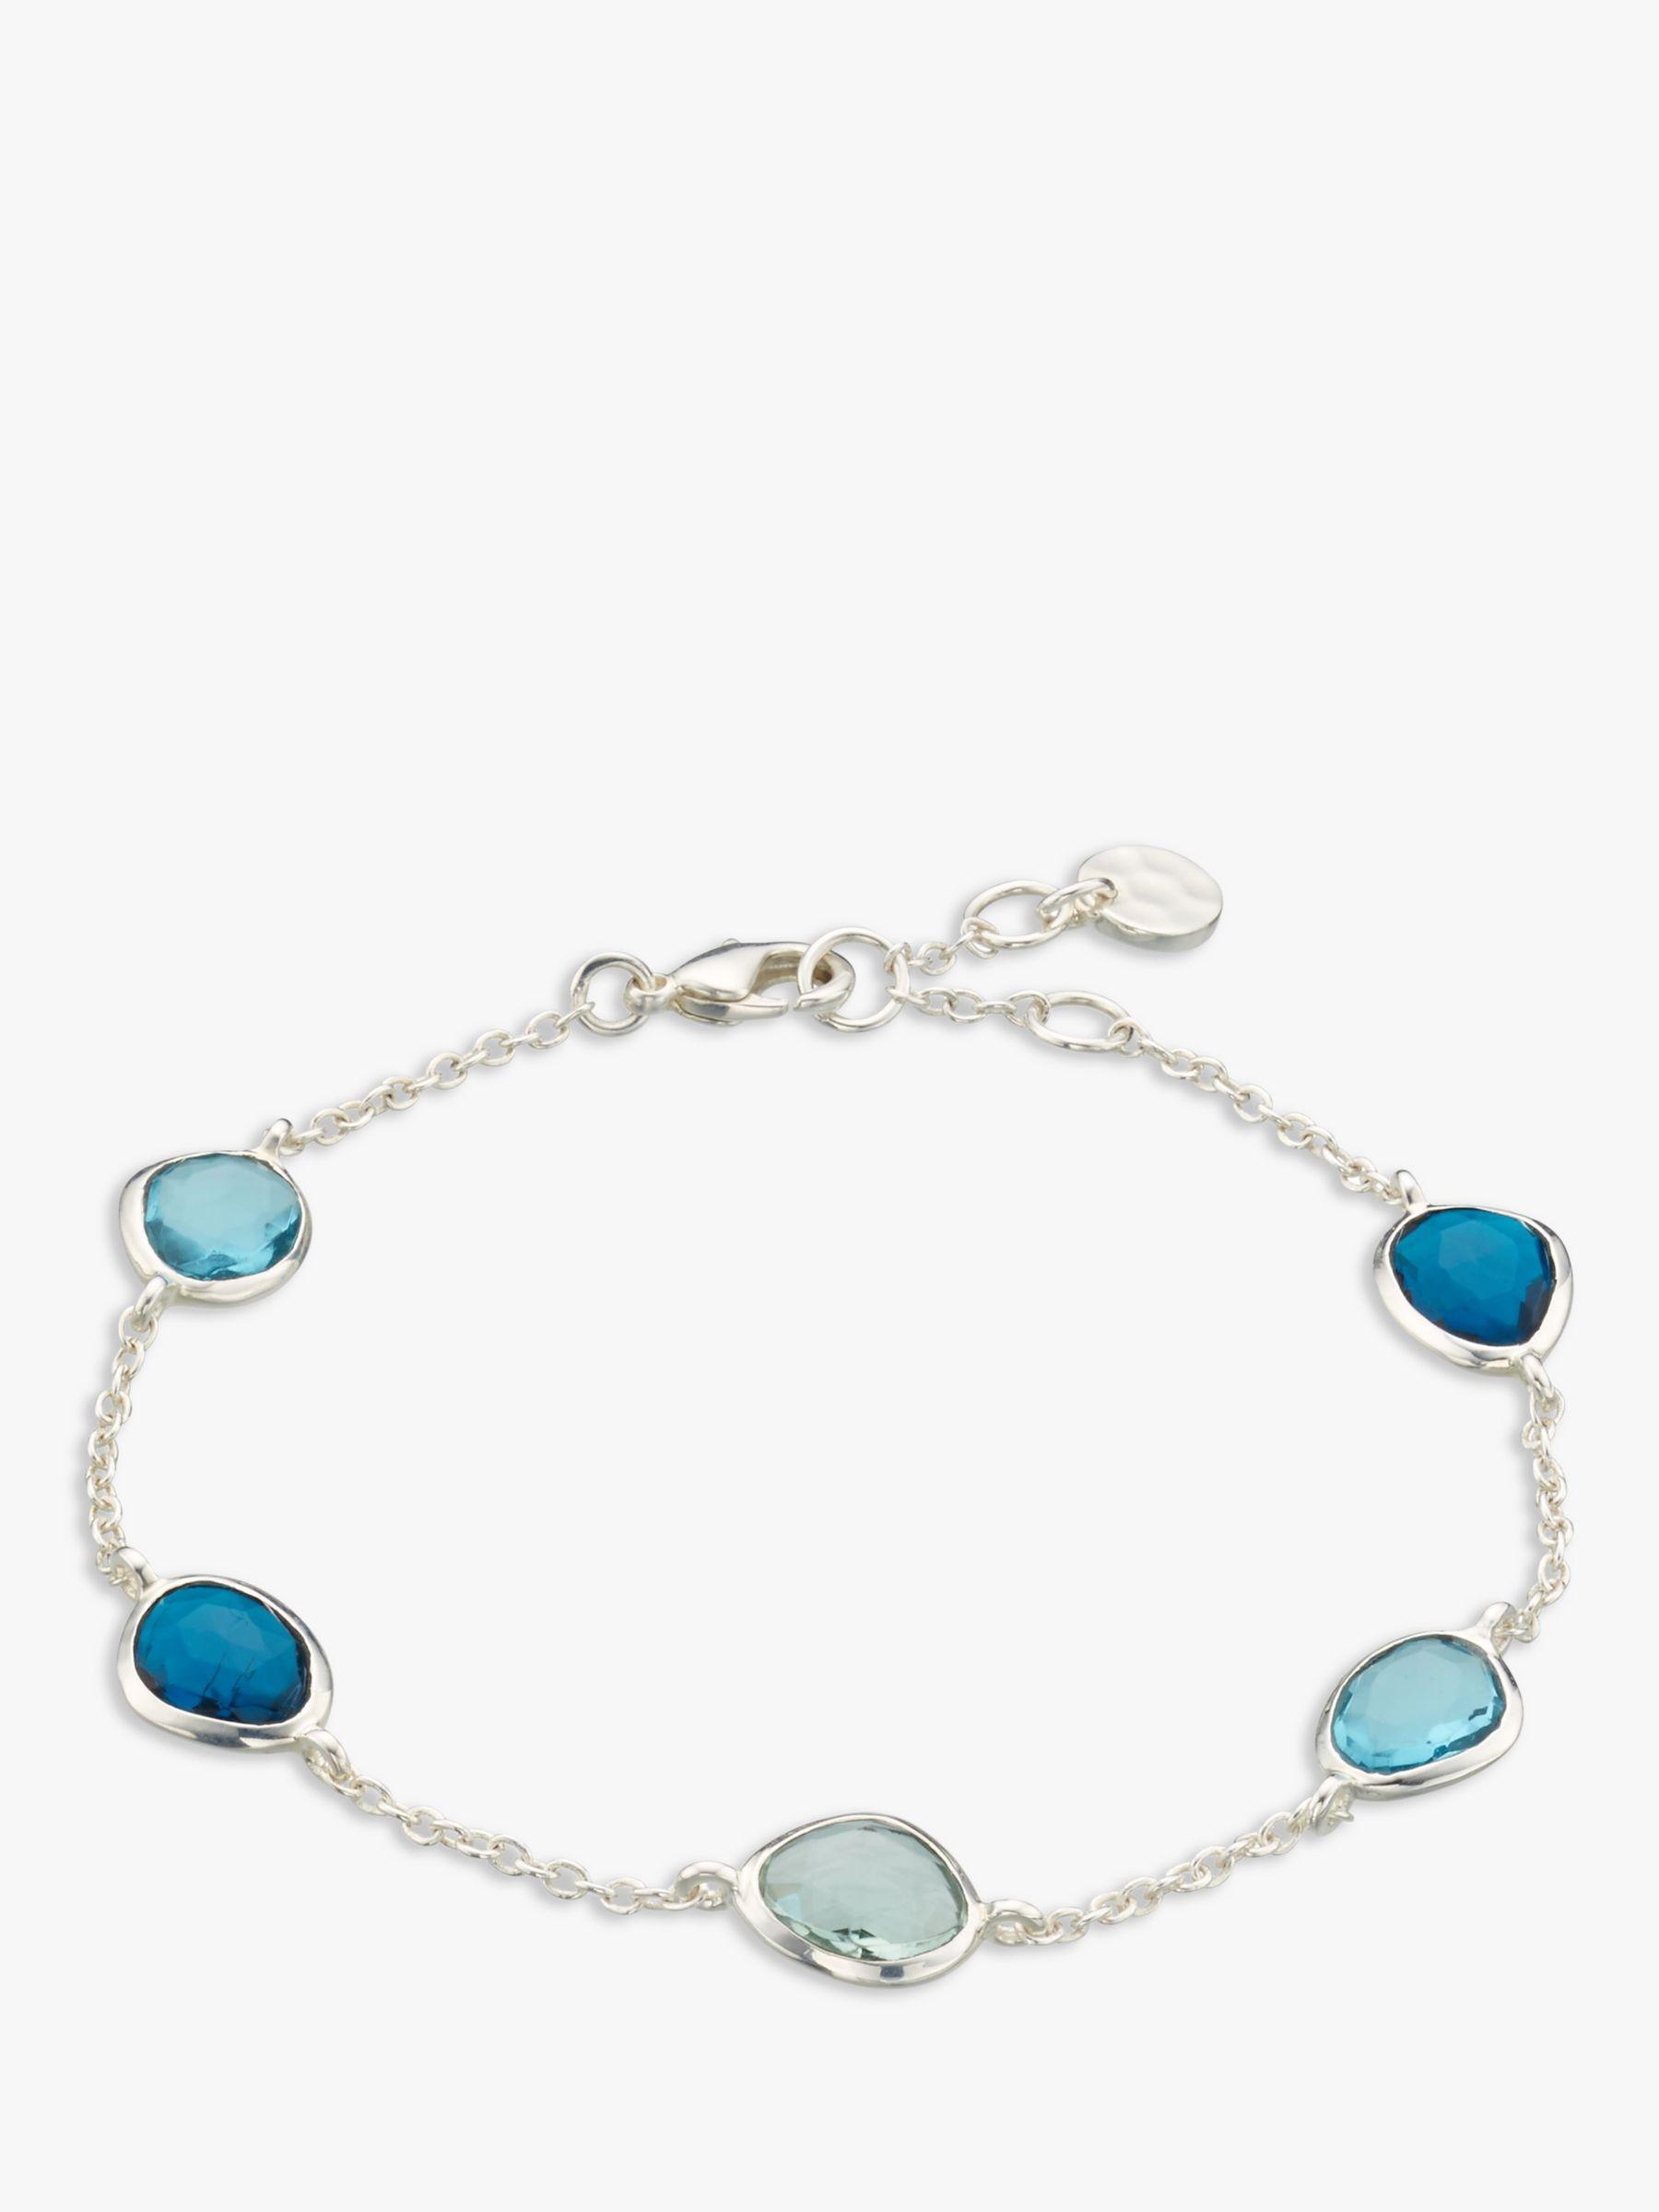 John Lewis Gemstones John Lewis Gemstones Topaz and Quartz Chain Bracelet, Silver/Multi